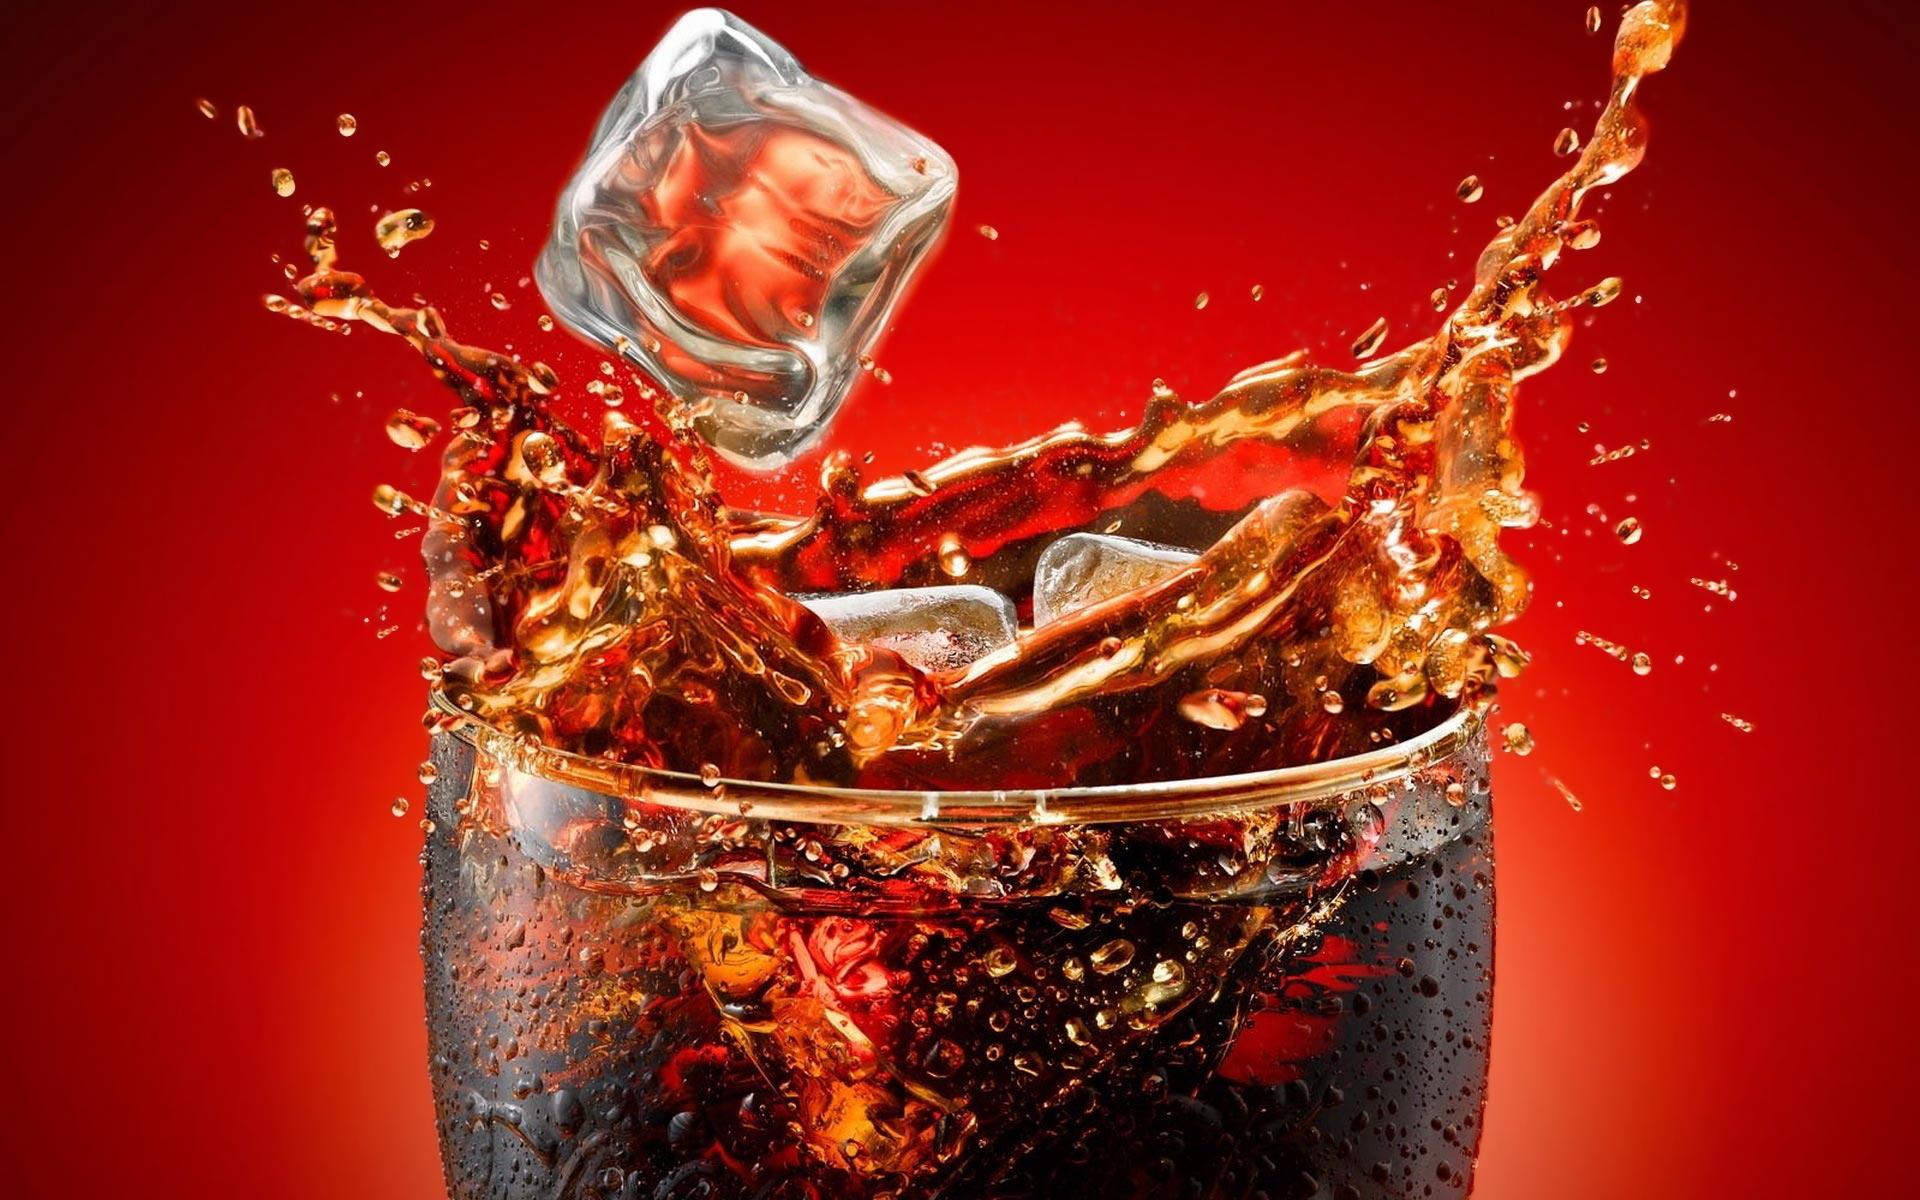 Coca cola ice